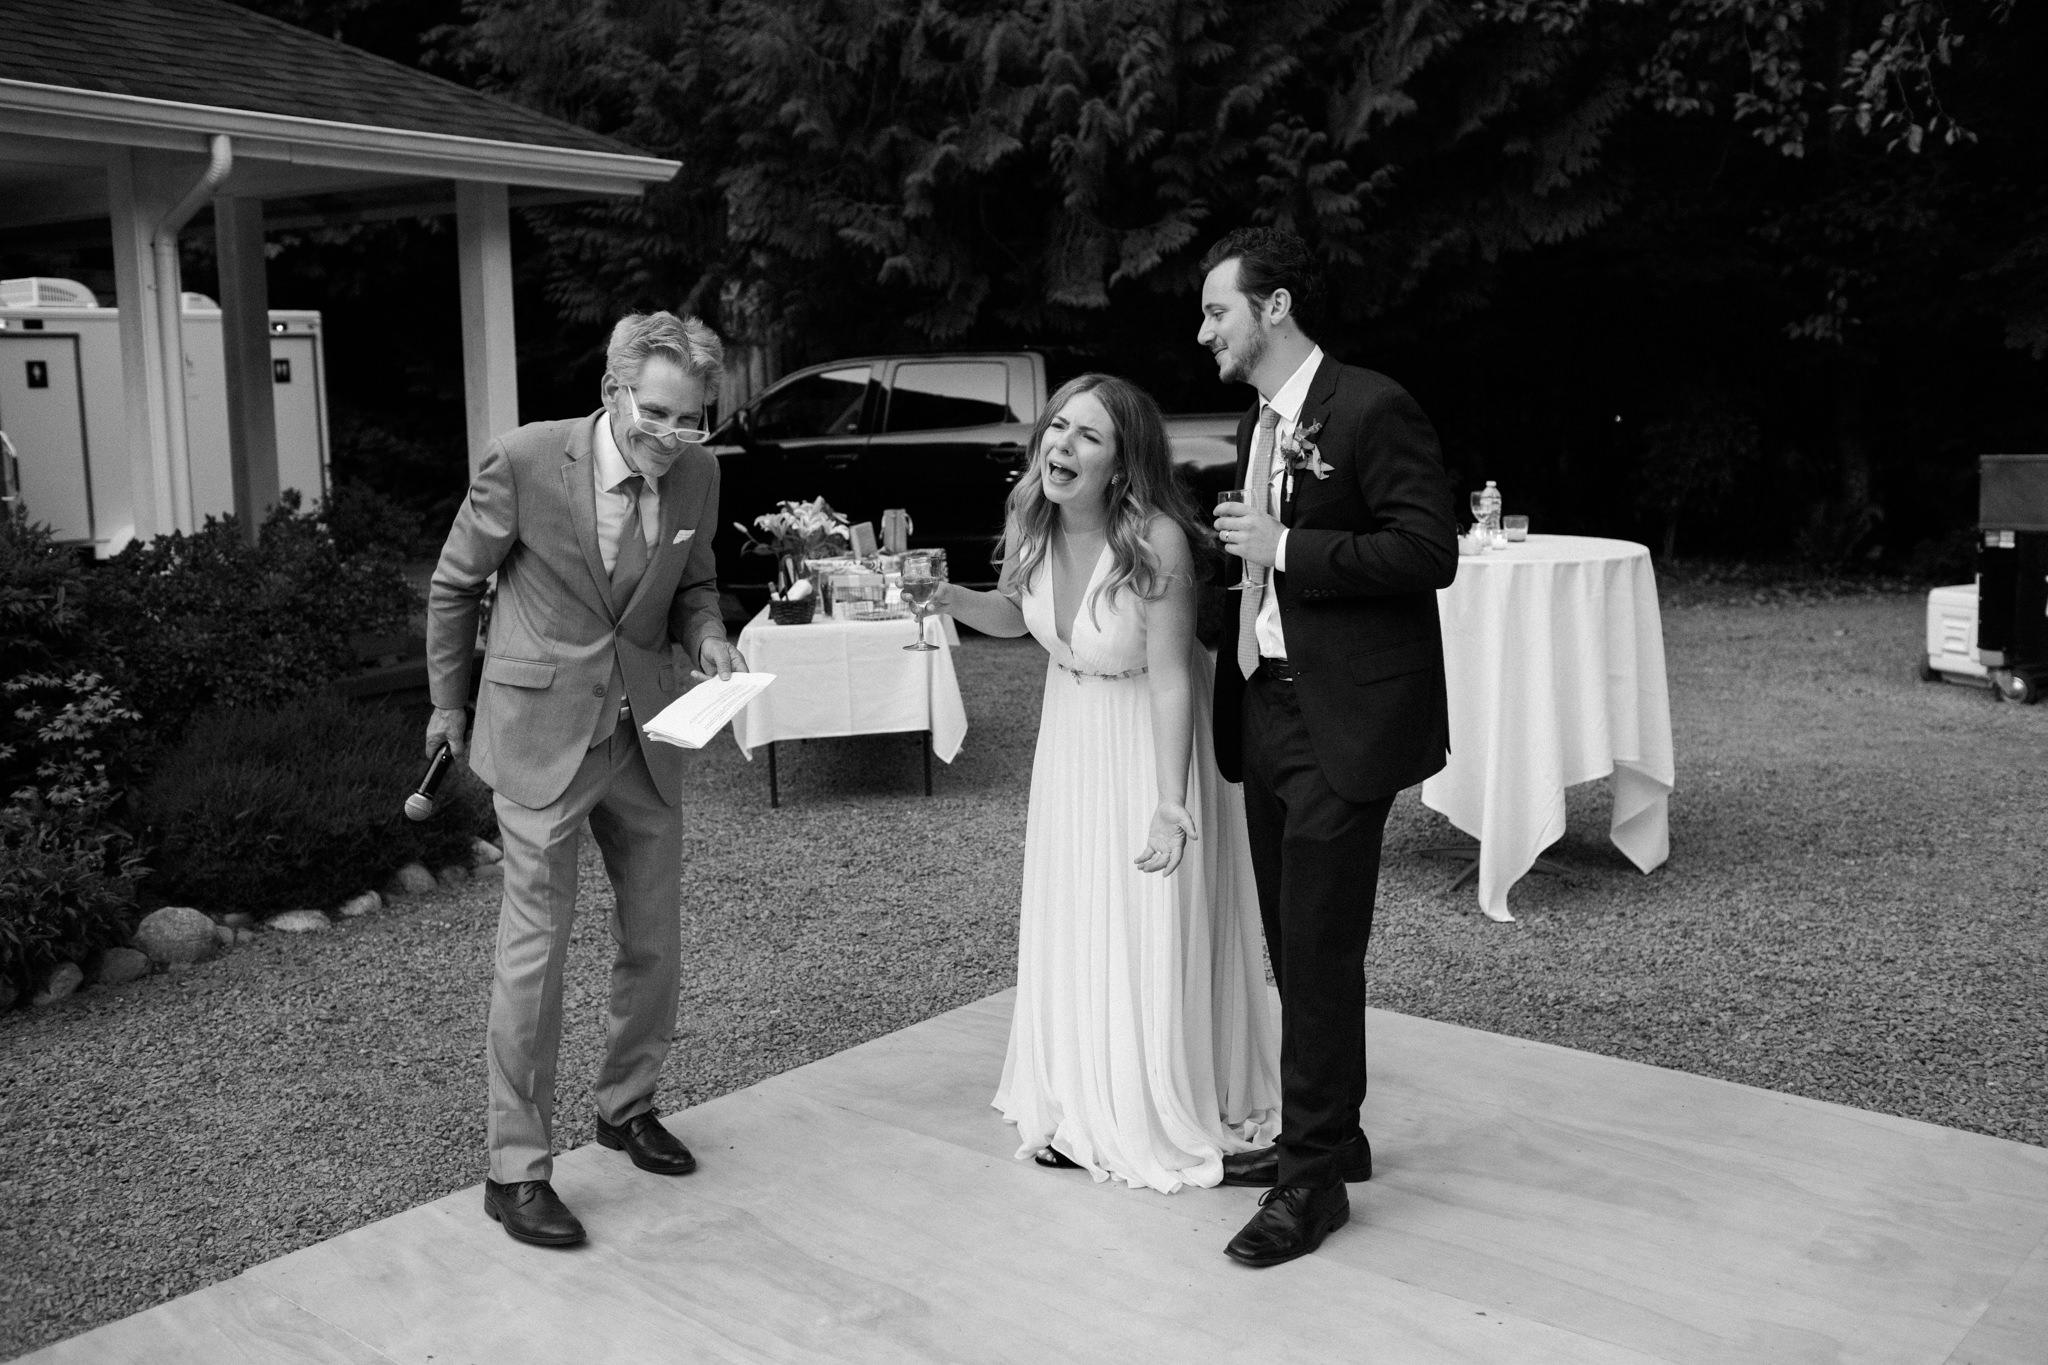 Backyard-Bainbridge-Island-Wedding-Alycia-Lovell-Photography-209.JPG